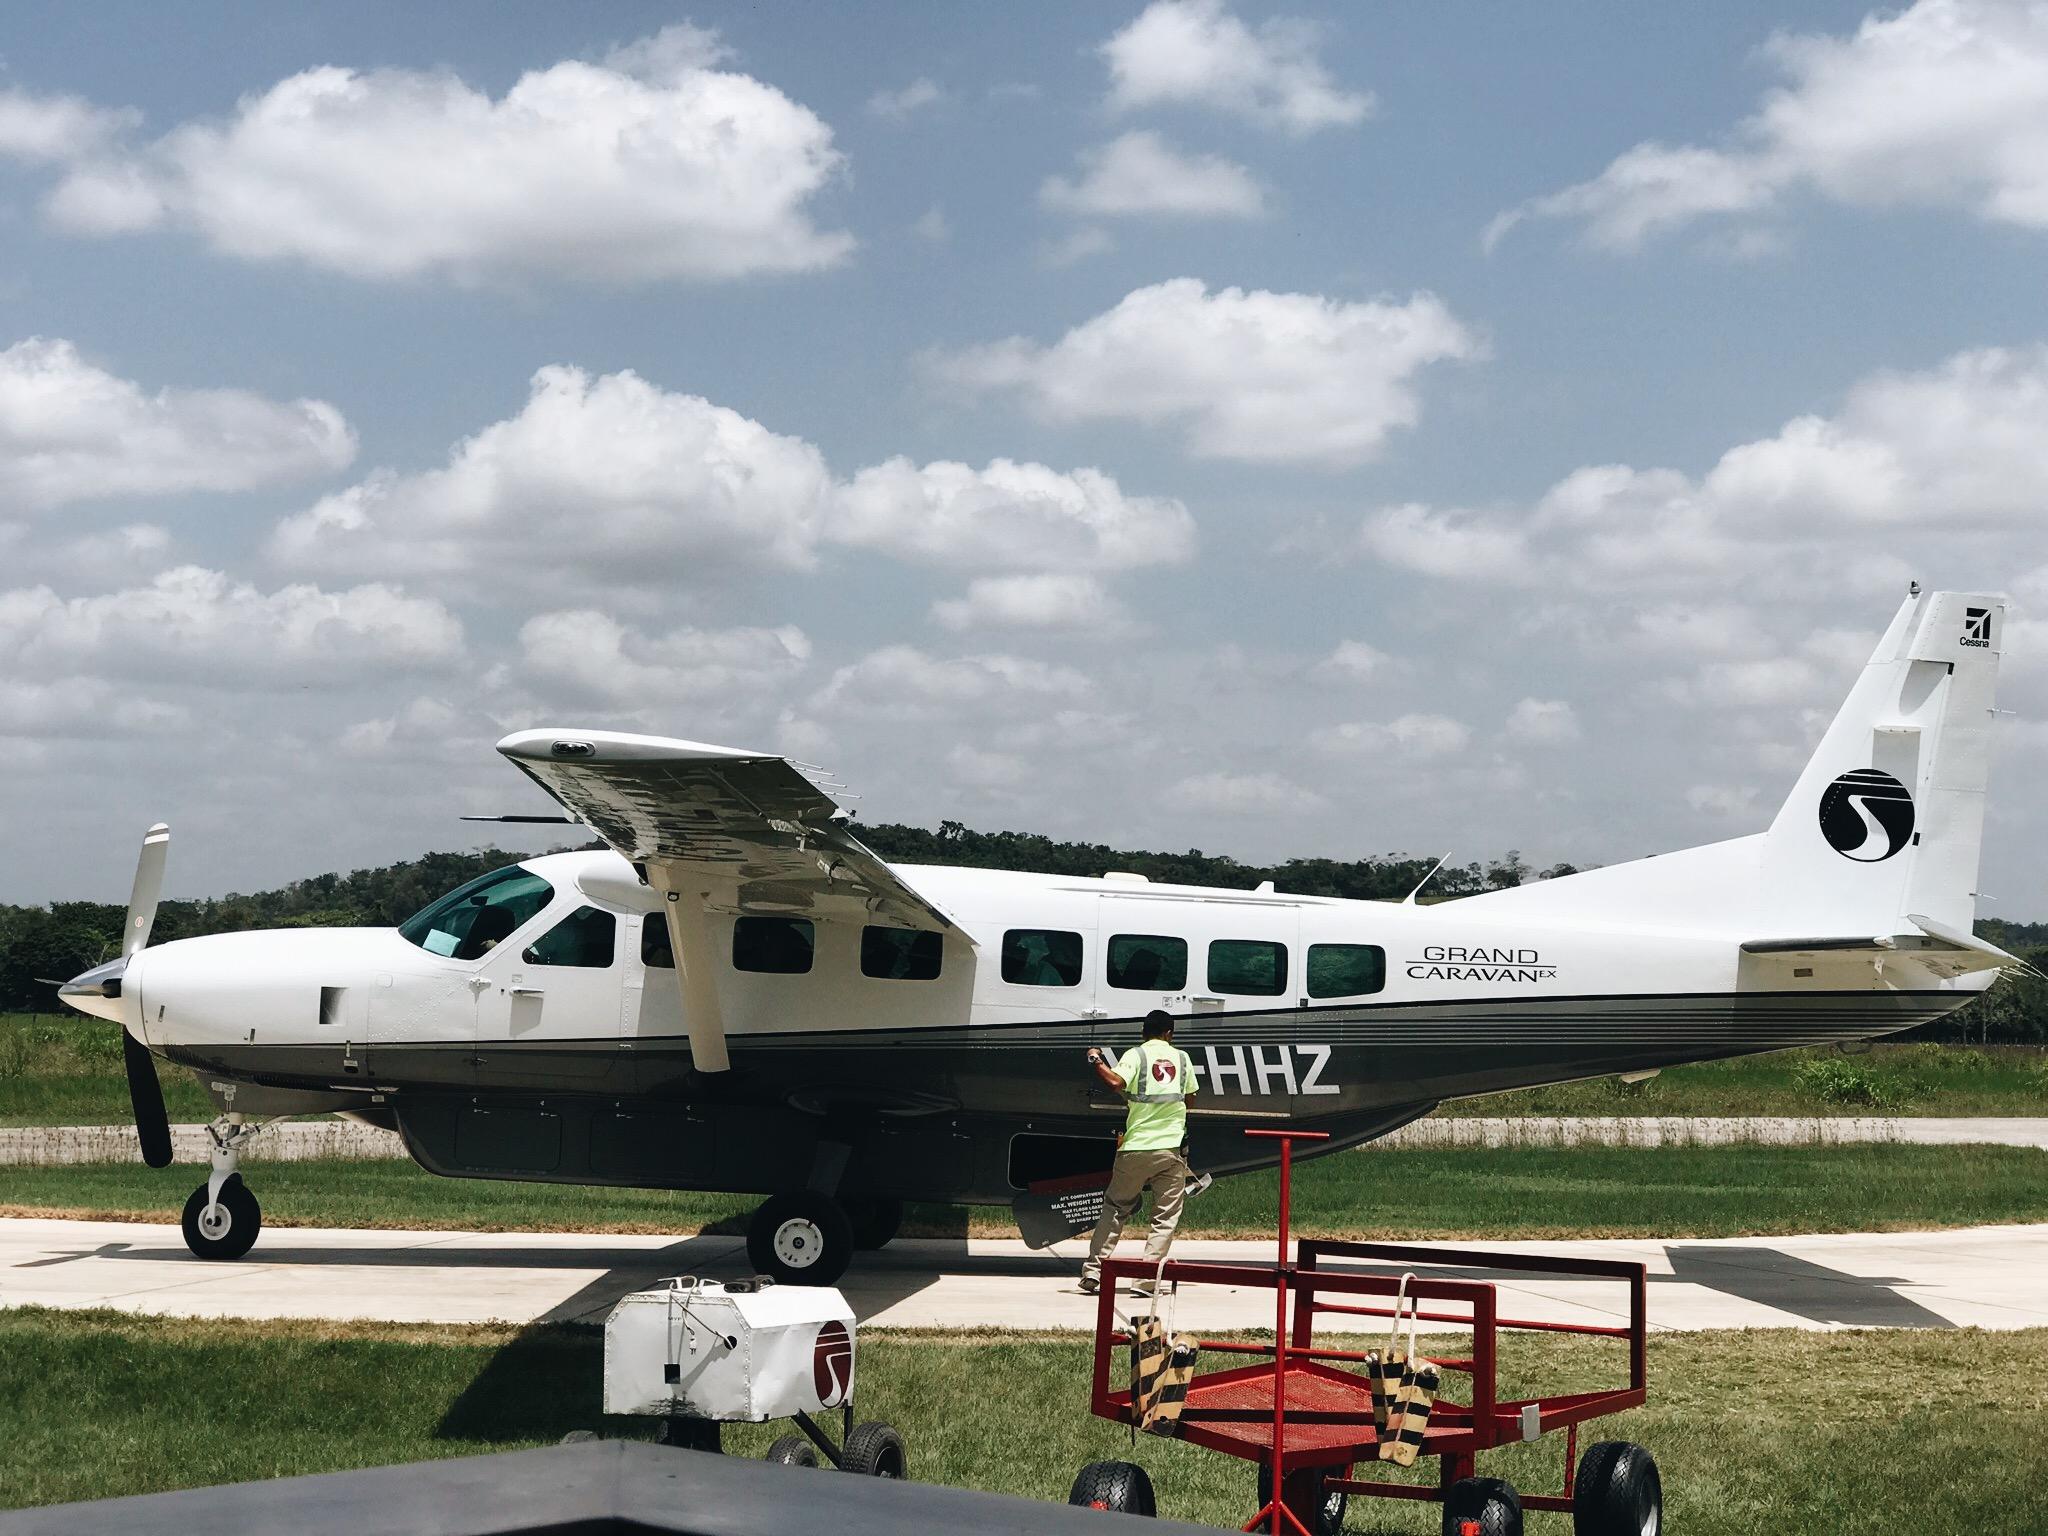 Tropic Air, Belize Travel Guide